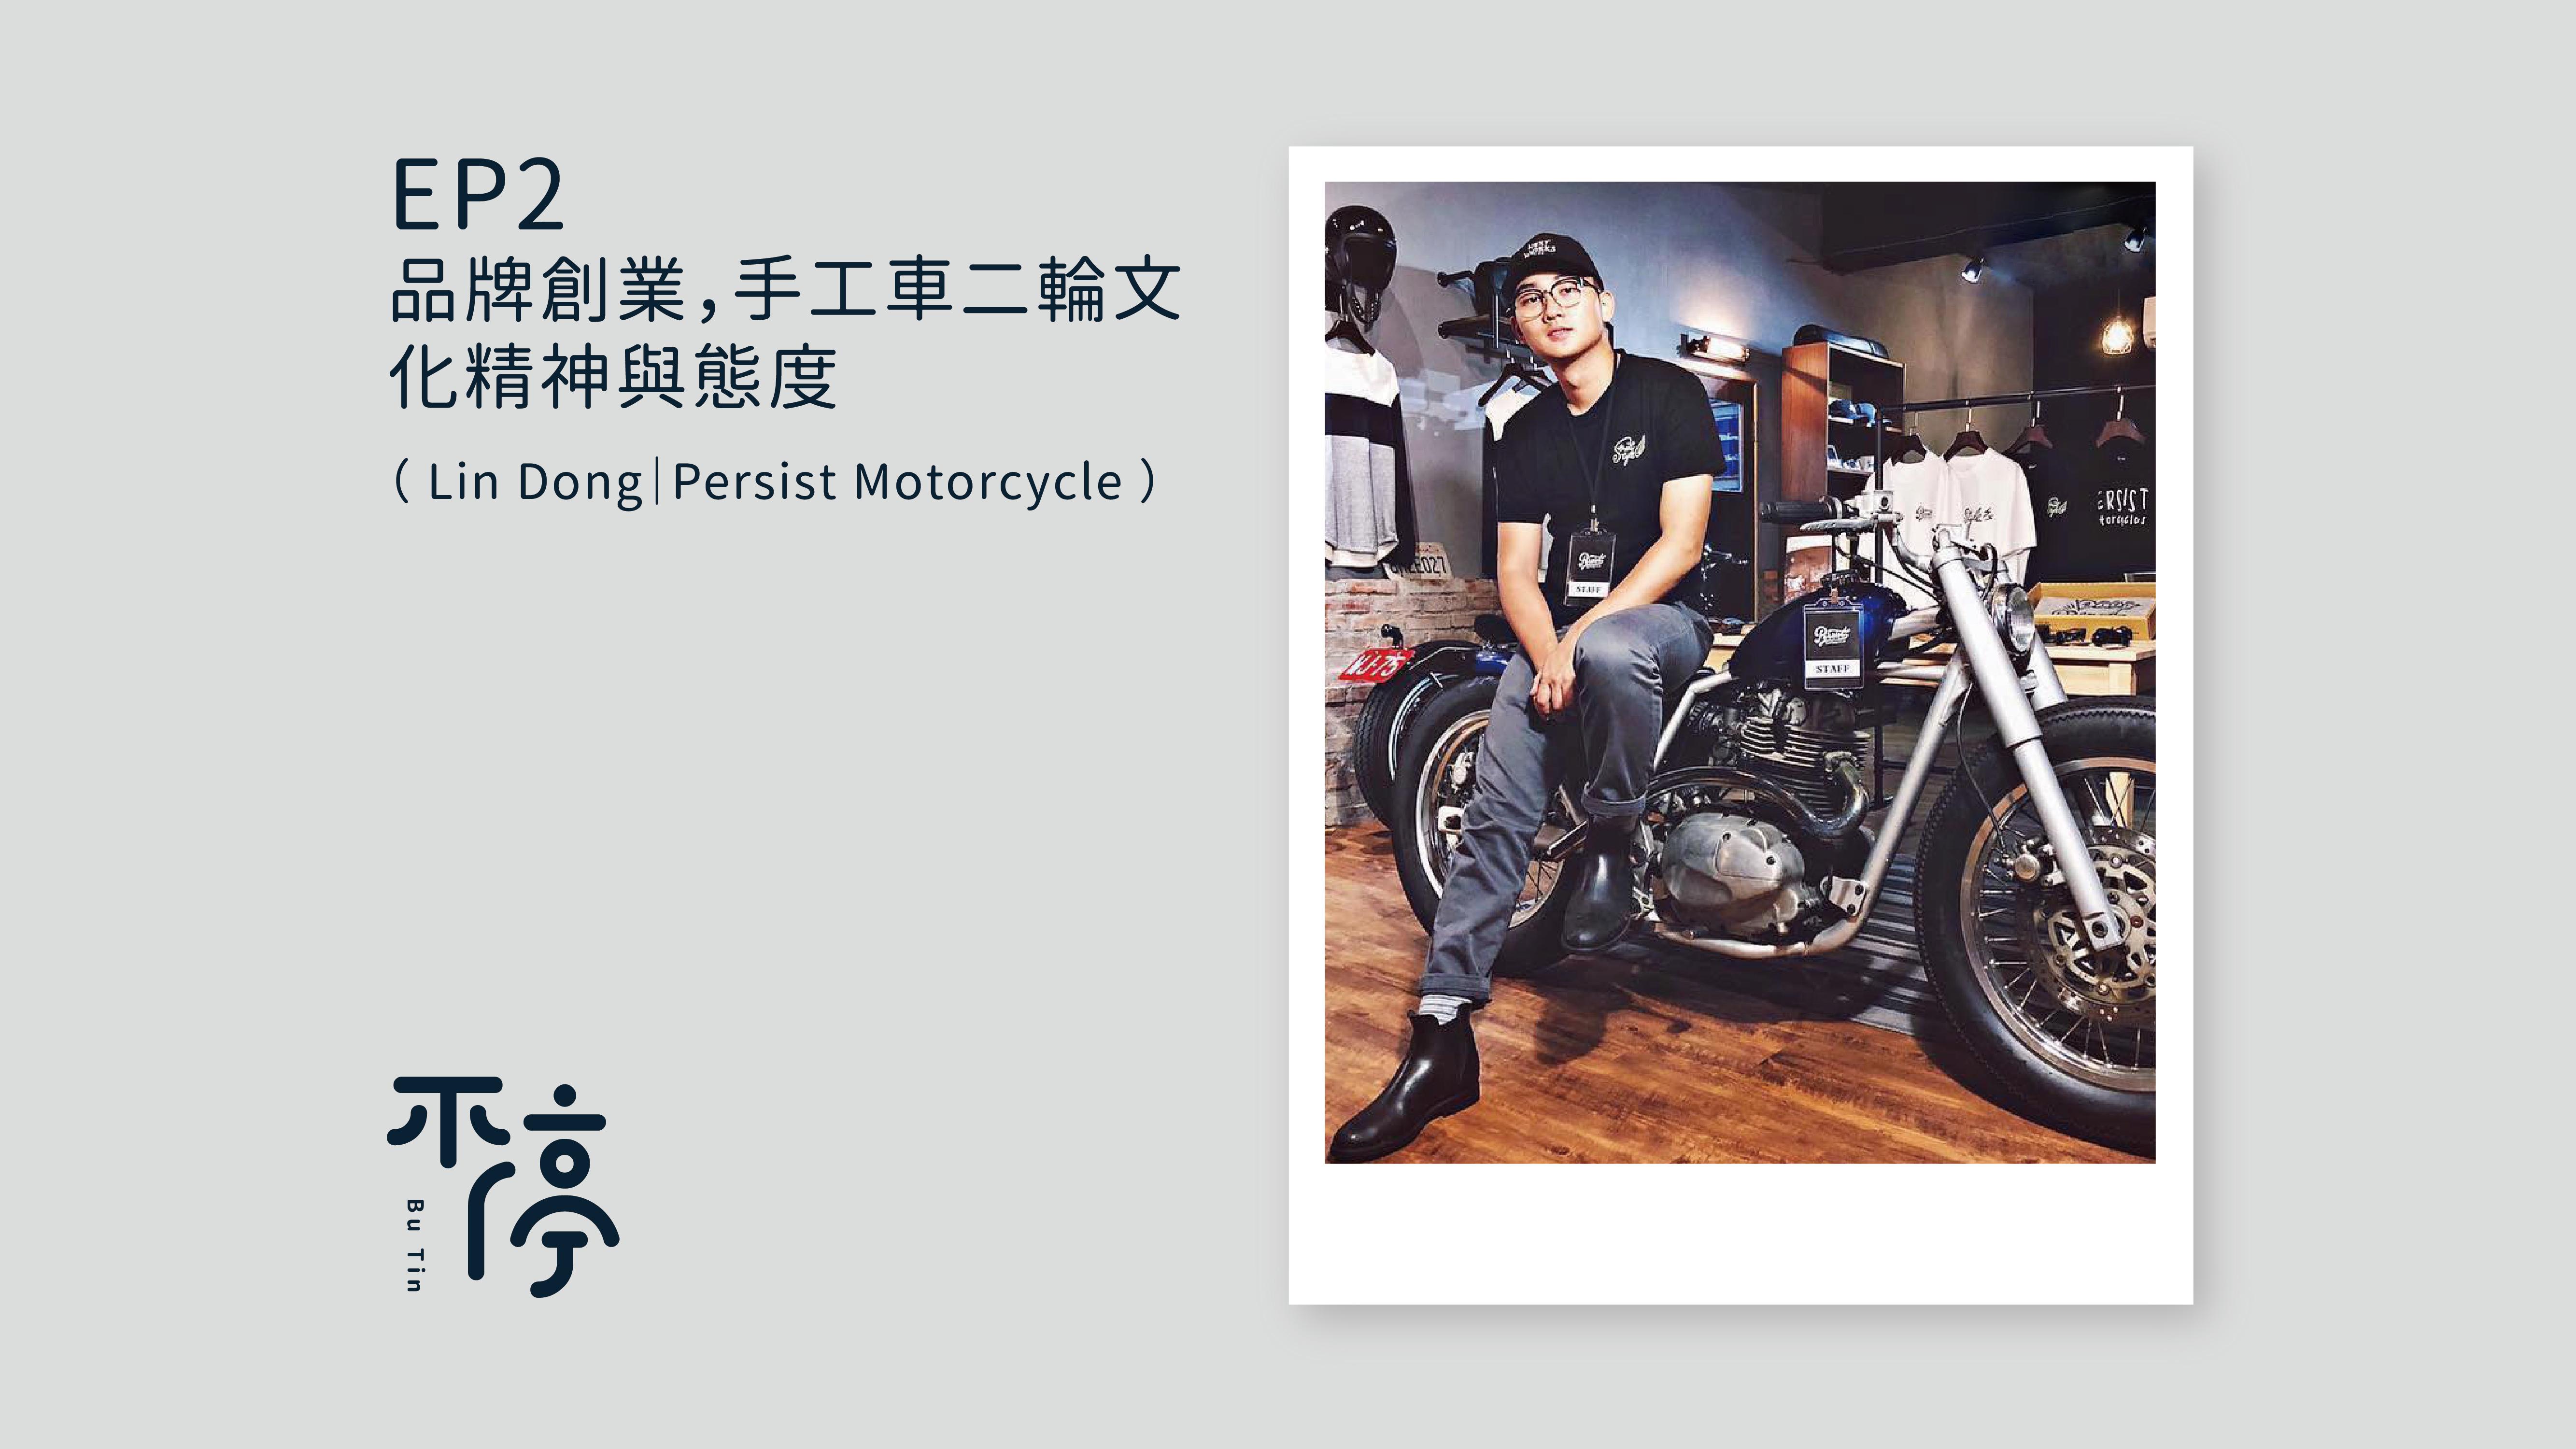 EP2 - 品牌創業,手工車二輪文化精神與態度( Persist Motorcycle - Lin Dong )